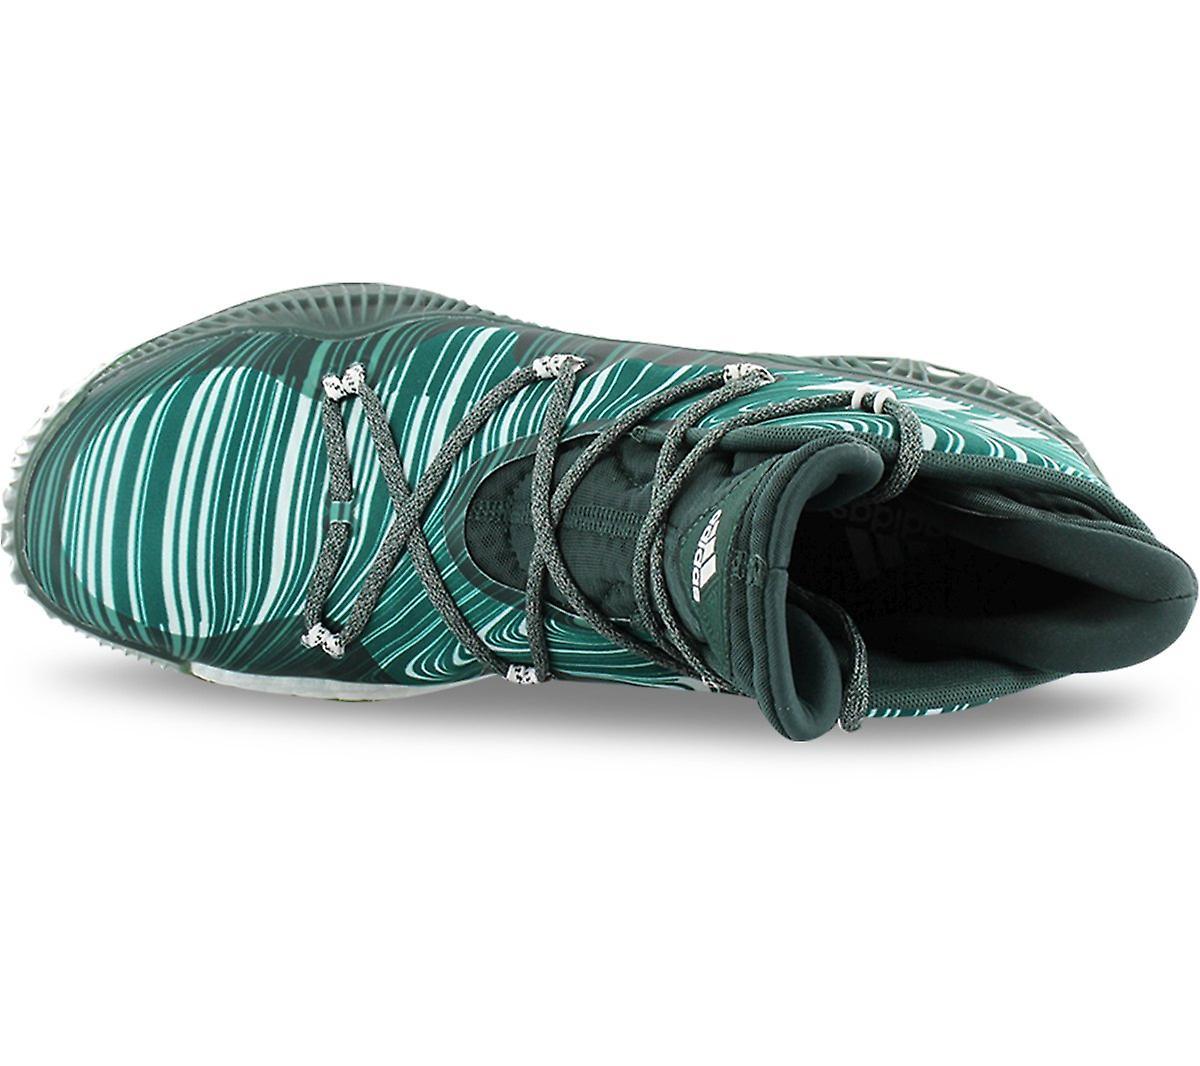 Adidas Crazy Explosive B42423 Herren Basketballschuhe Grün Sneakers Sportschuhe